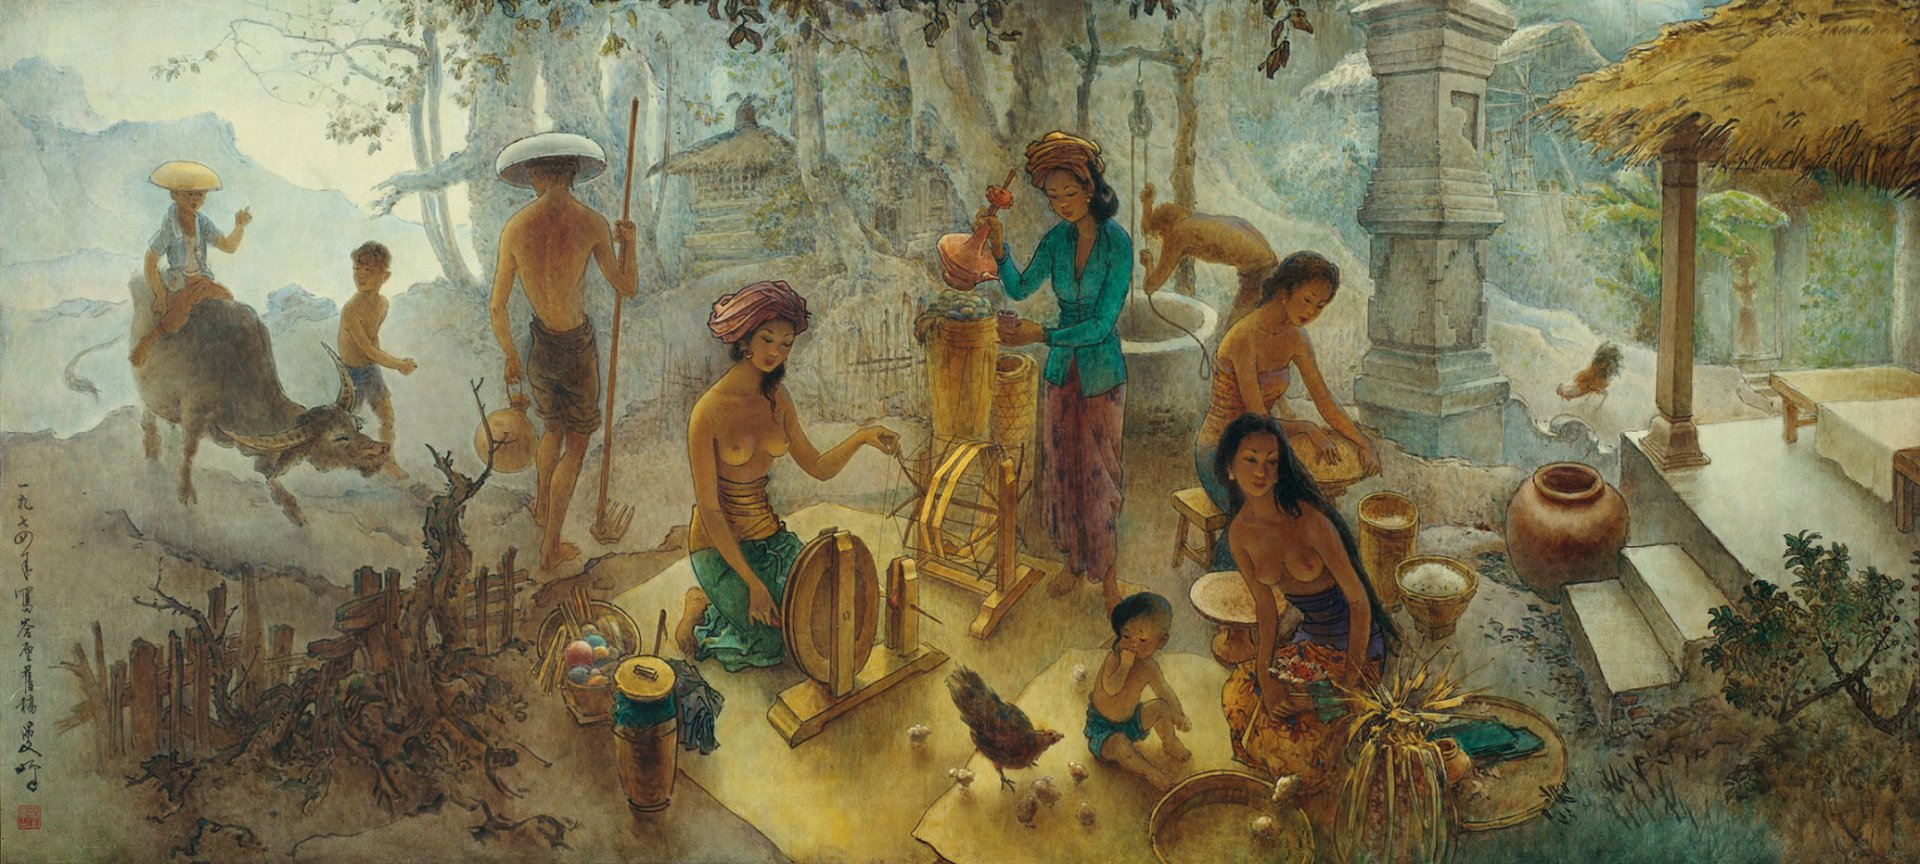 Lee-Man-Fong_Bali-Life.jpg